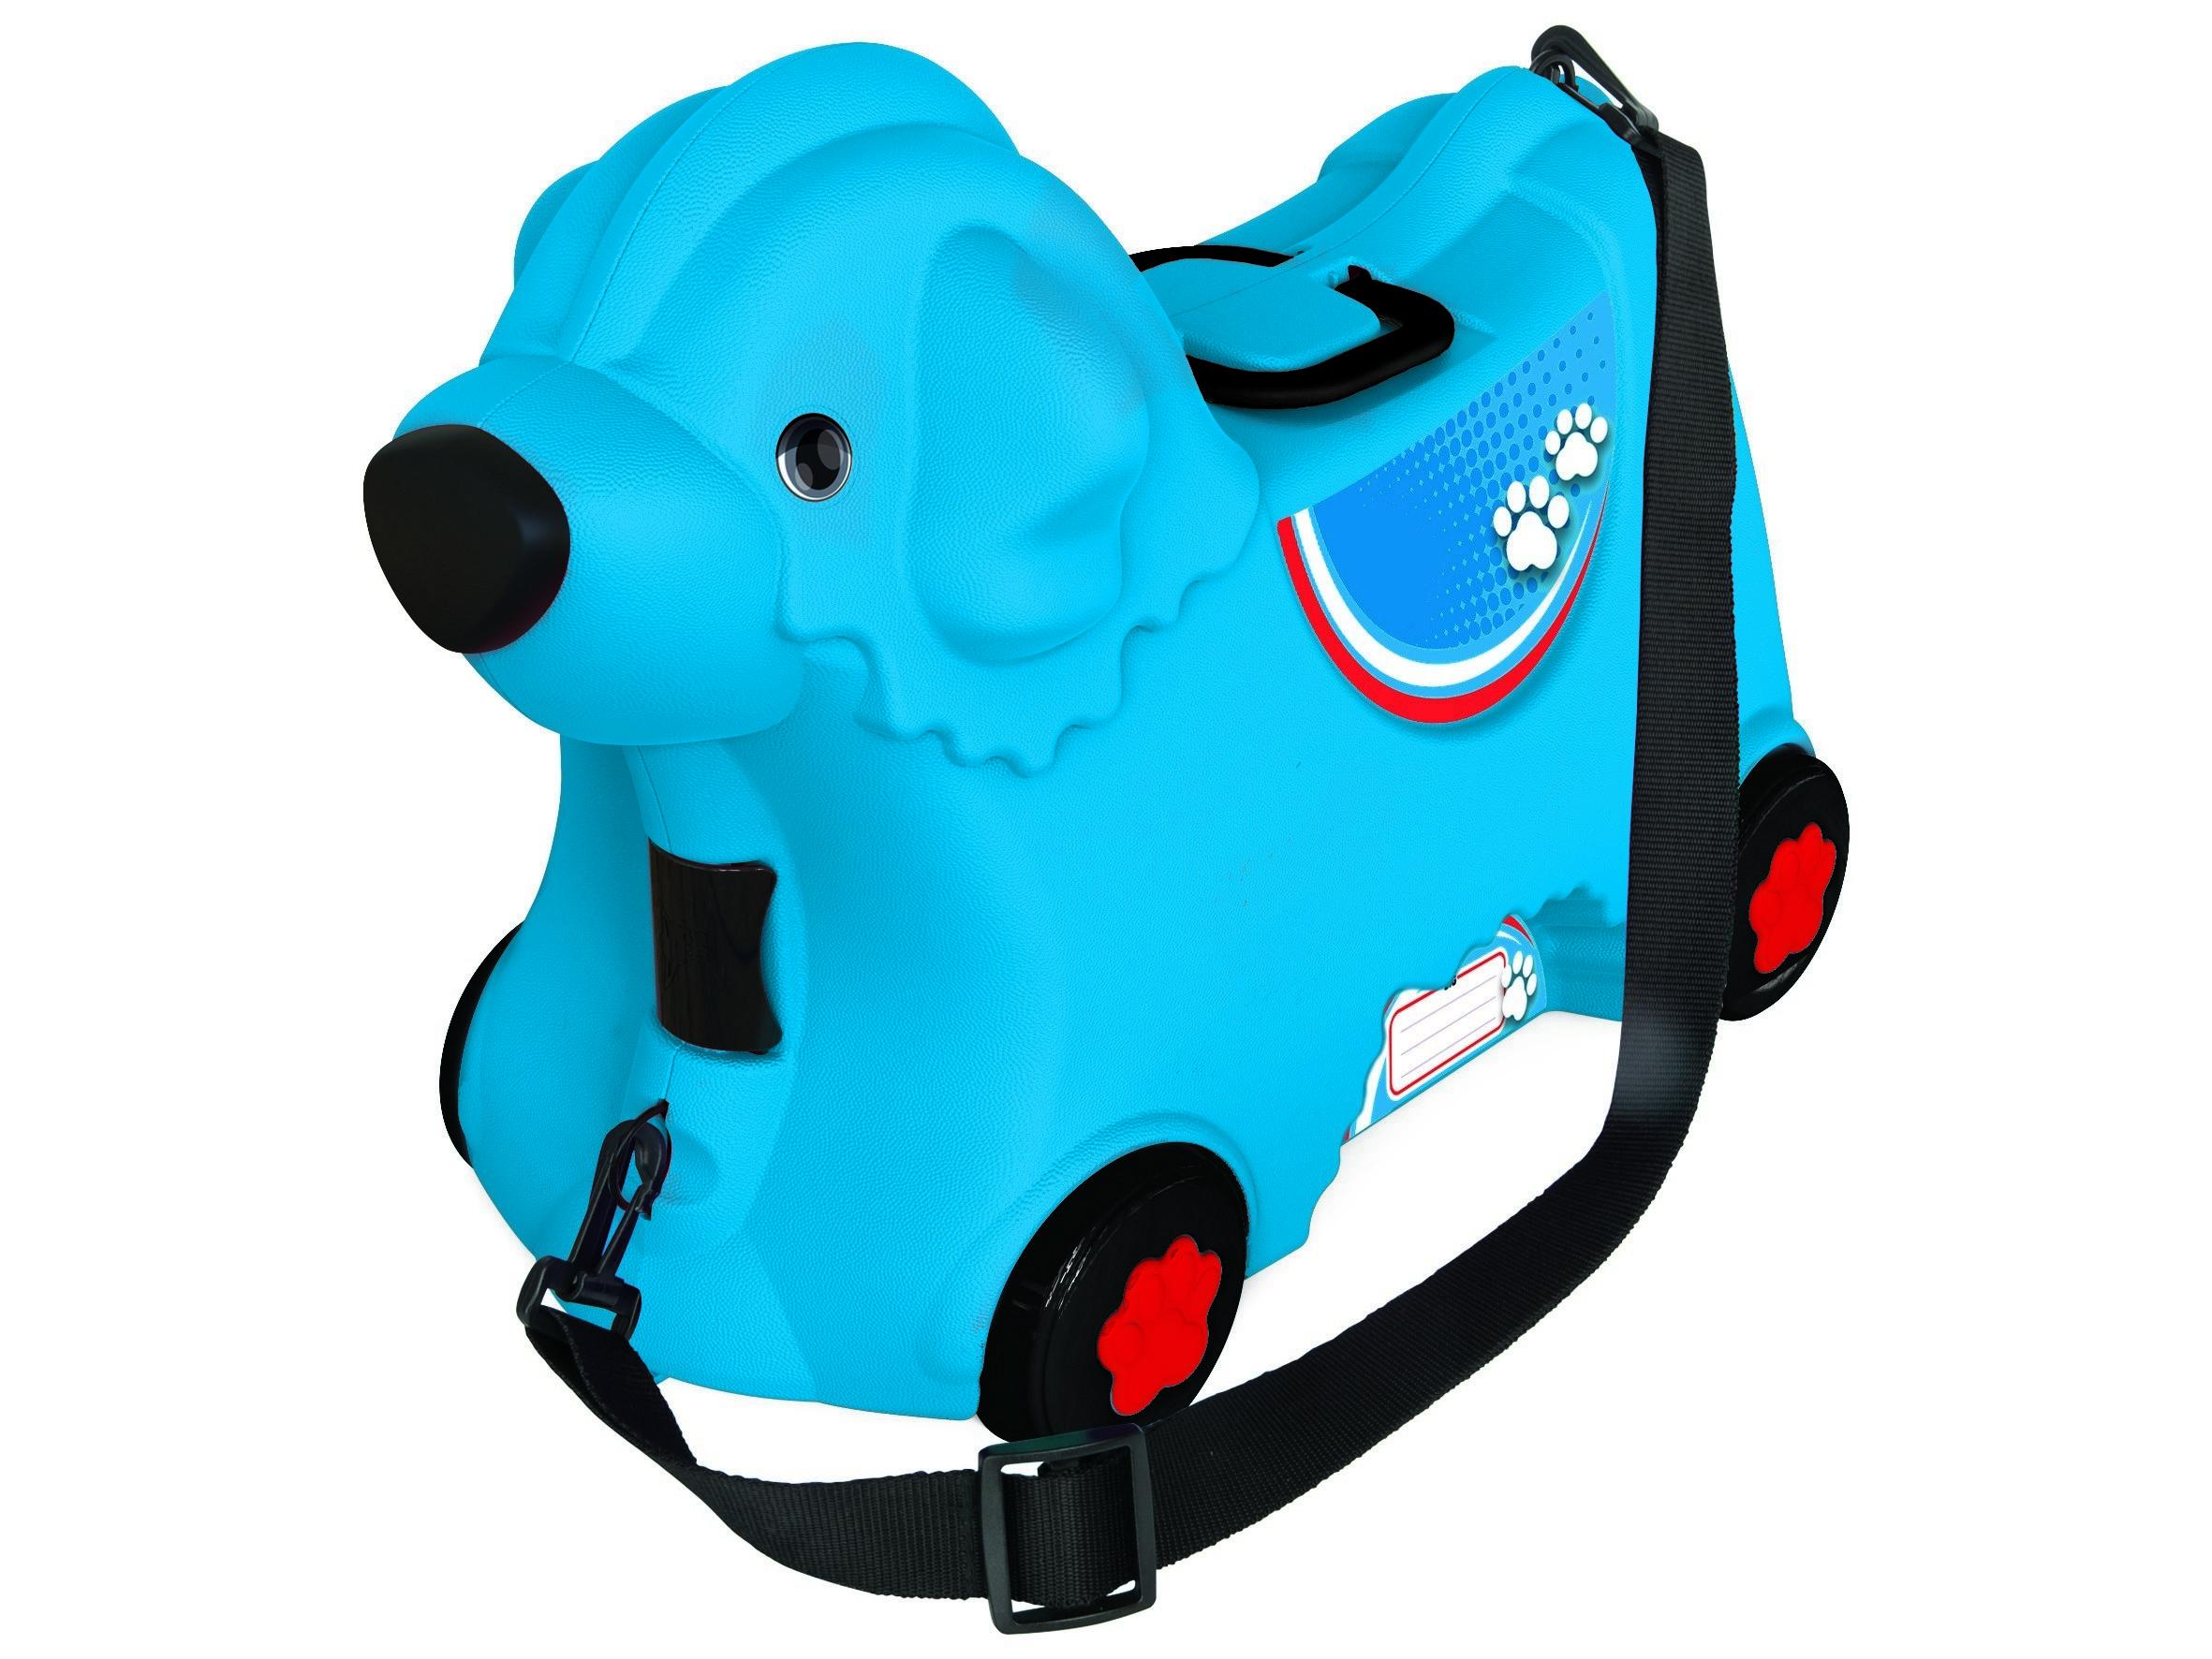 Детский чемодан на колесиках, синий - Чемоданы для путешествий, артикул: 161195